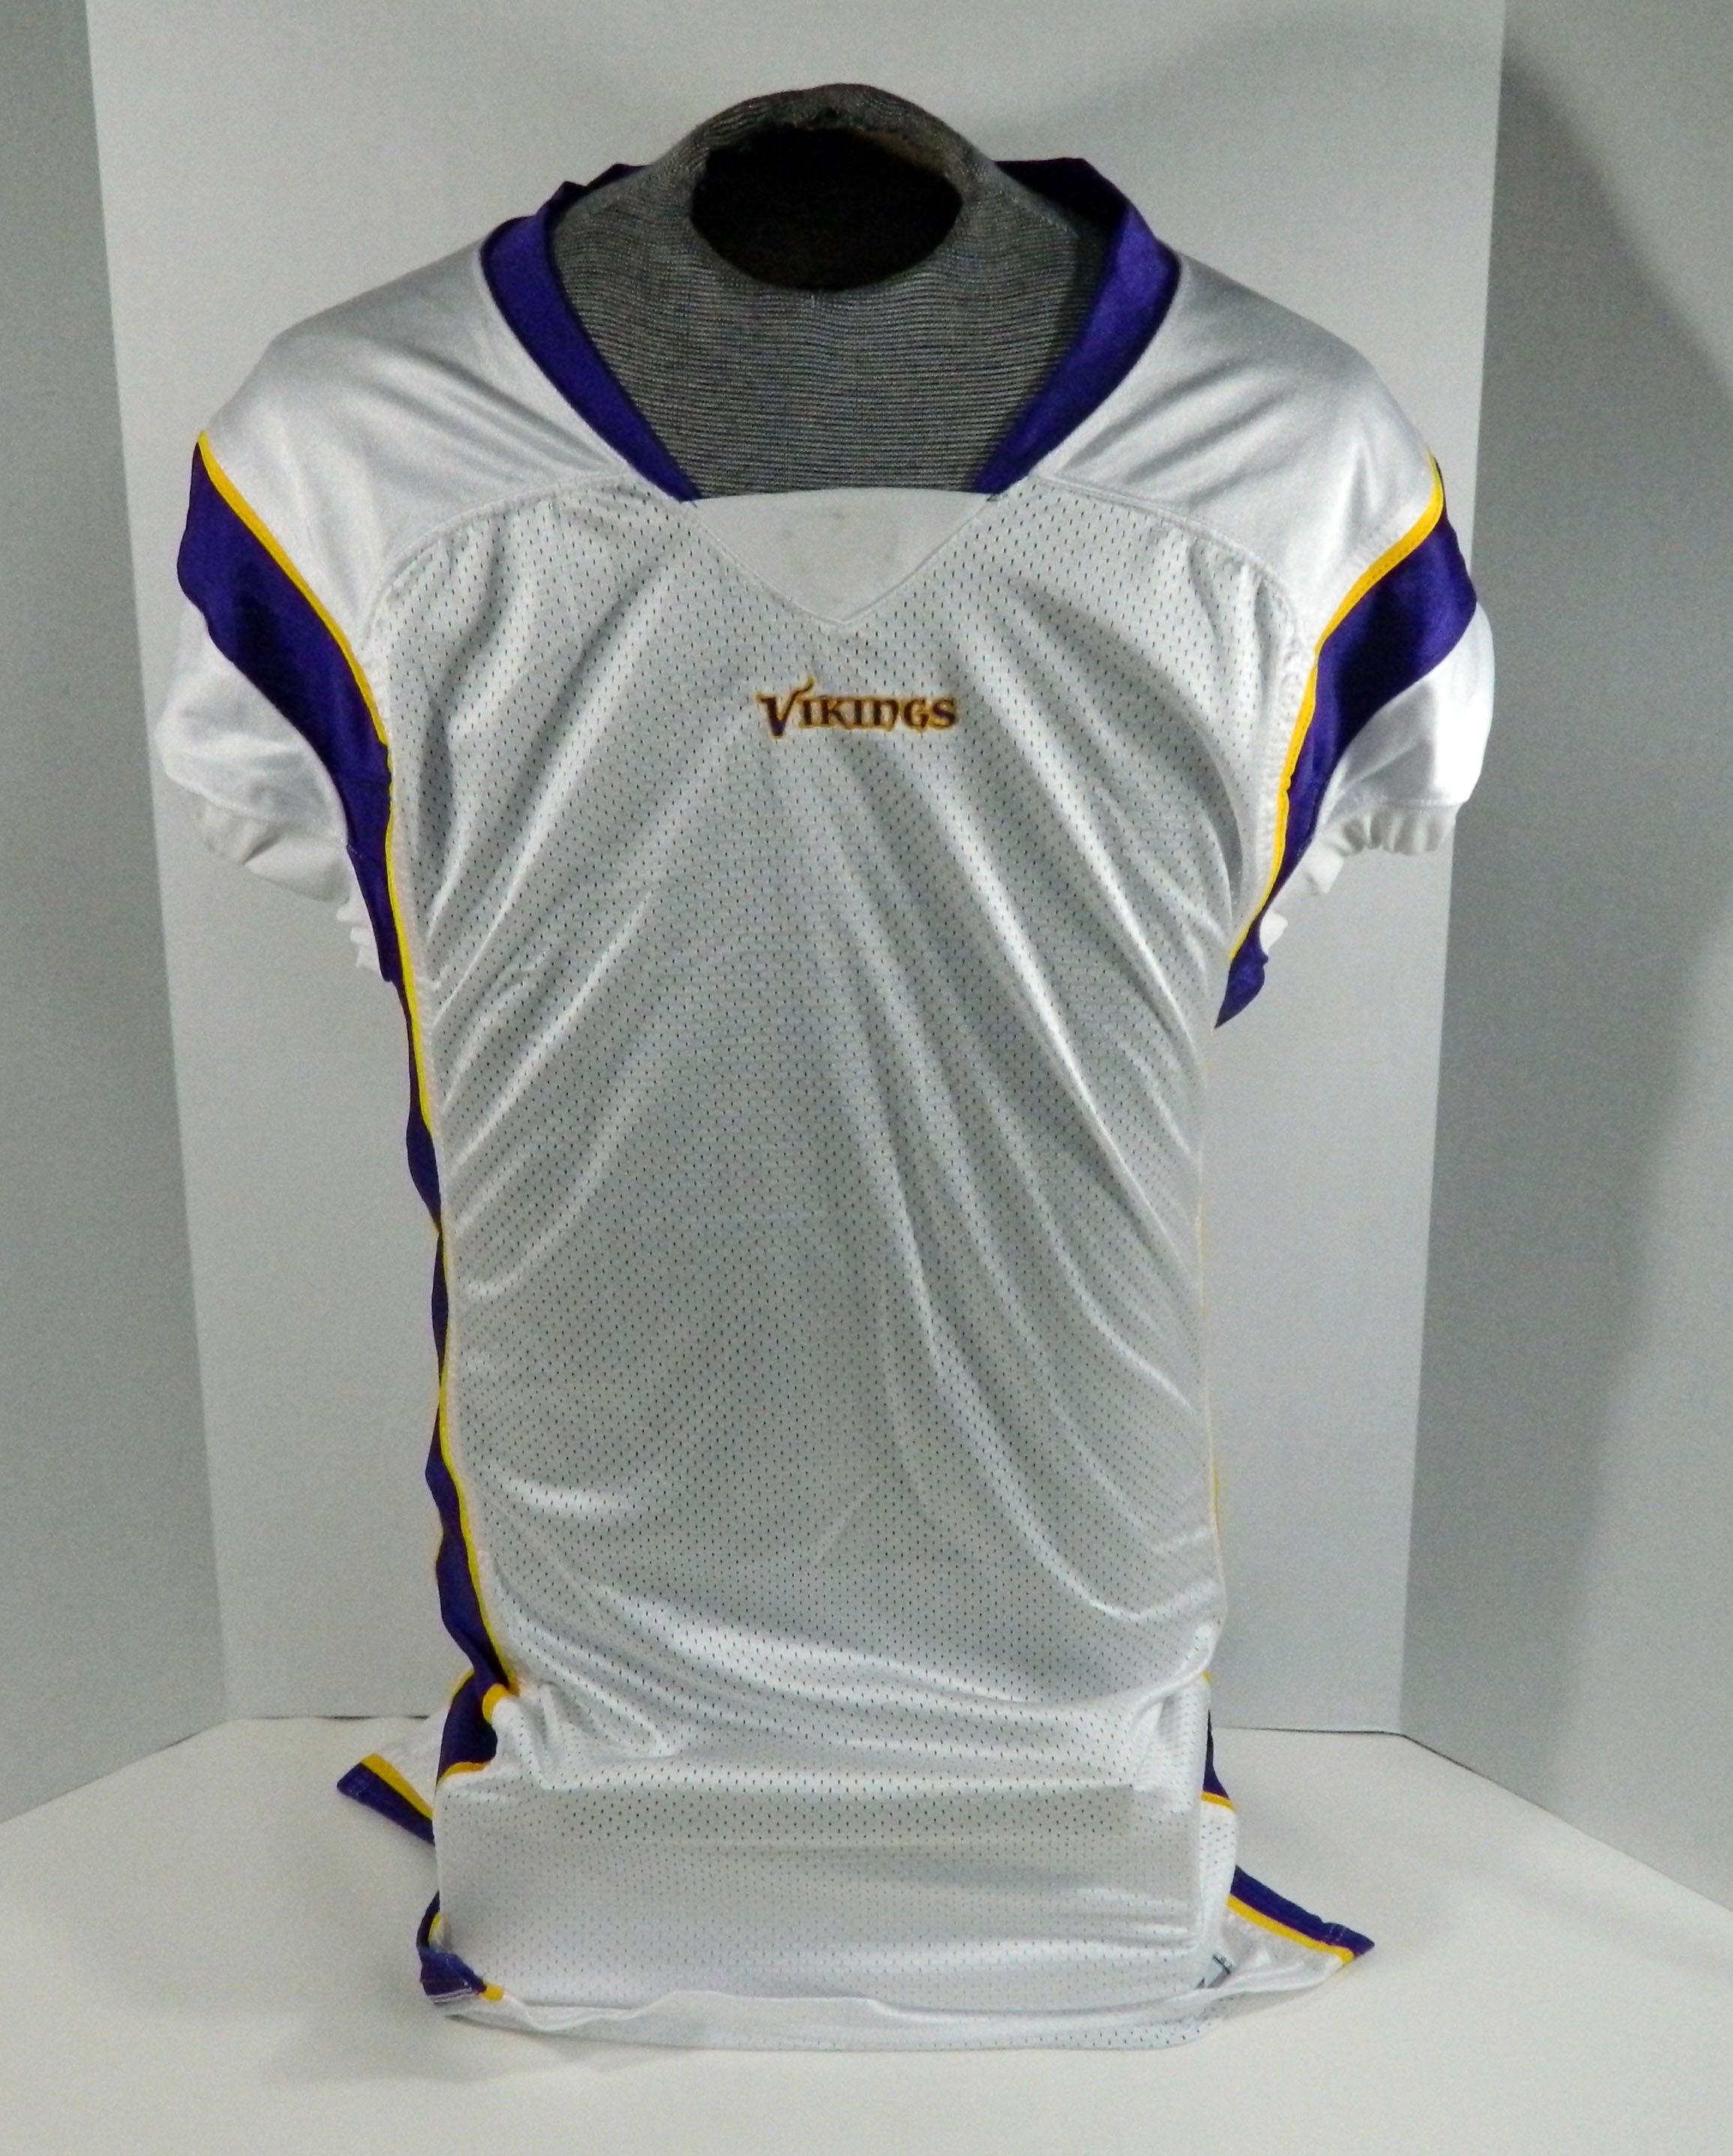 2007 Minnesota Vikings Game Issued White Jersey